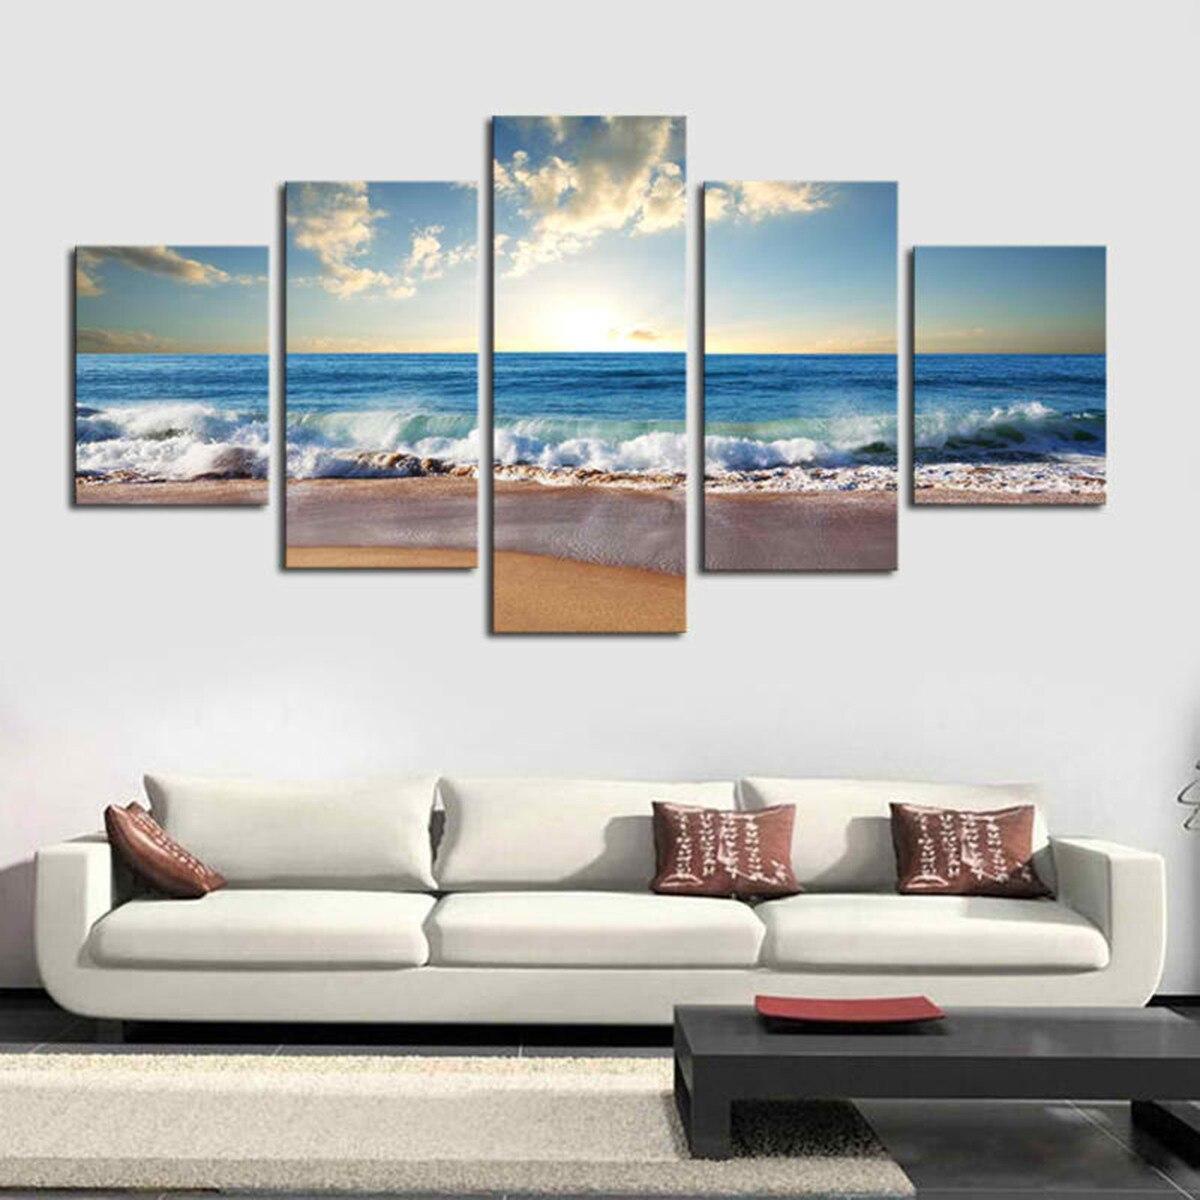 ᗚJERMYN 5 Panel Moderna de la Lona Impresa Pintura Al Óleo Playa ...